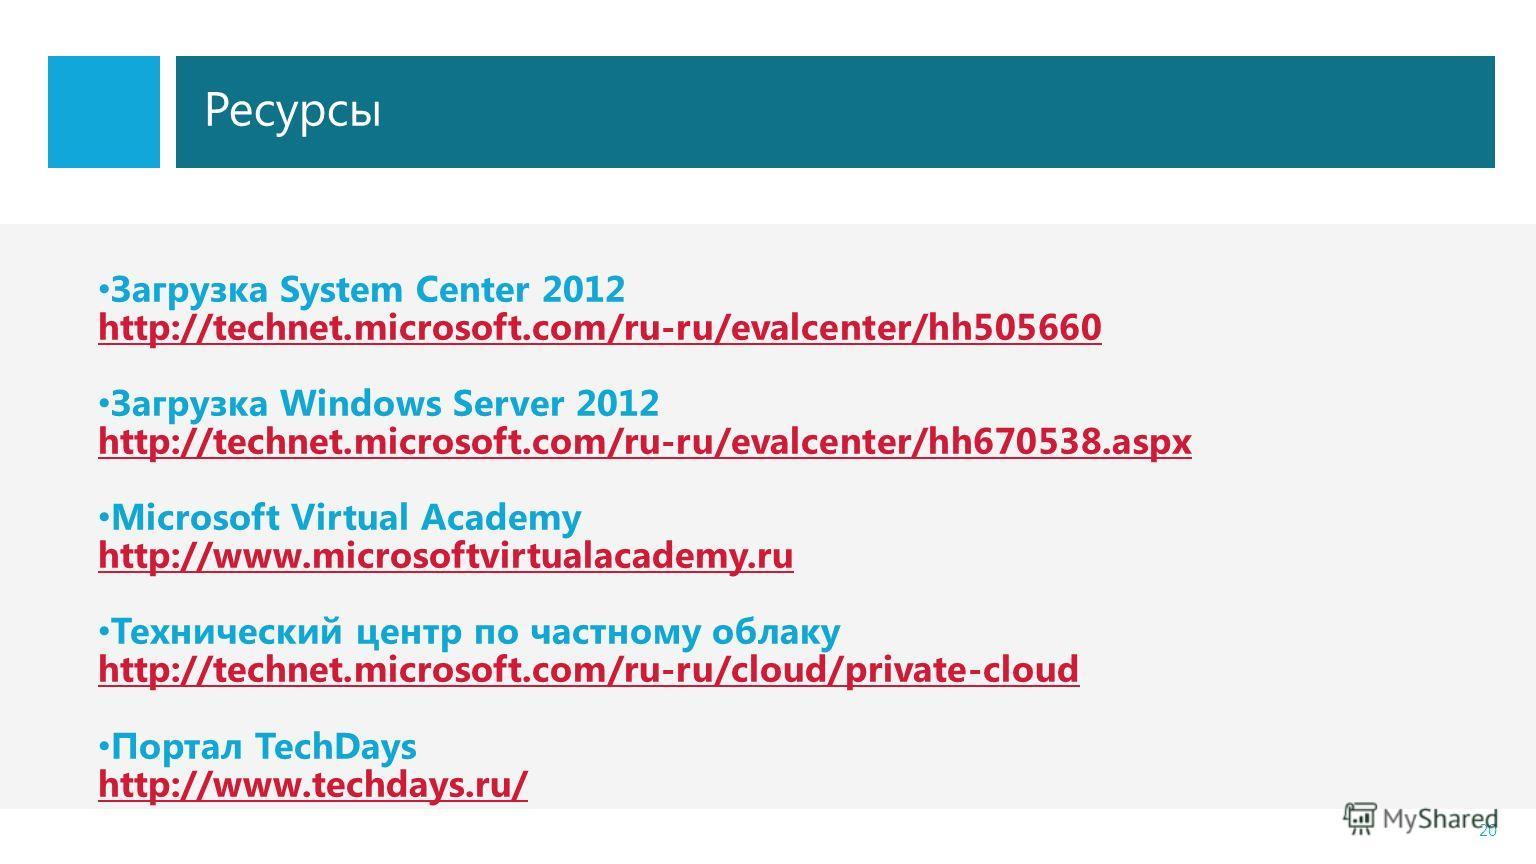 Ресурсы 20 Загрузка System Center 2012 http://technet.microsoft.com/ru-ru/evalcenter/hh505660 Загрузка Windows Server 2012 http://technet.microsoft.com/ru-ru/evalcenter/hh670538.aspx Microsoft Virtual Academy http://www.microsoftvirtualacademy.ru Тех